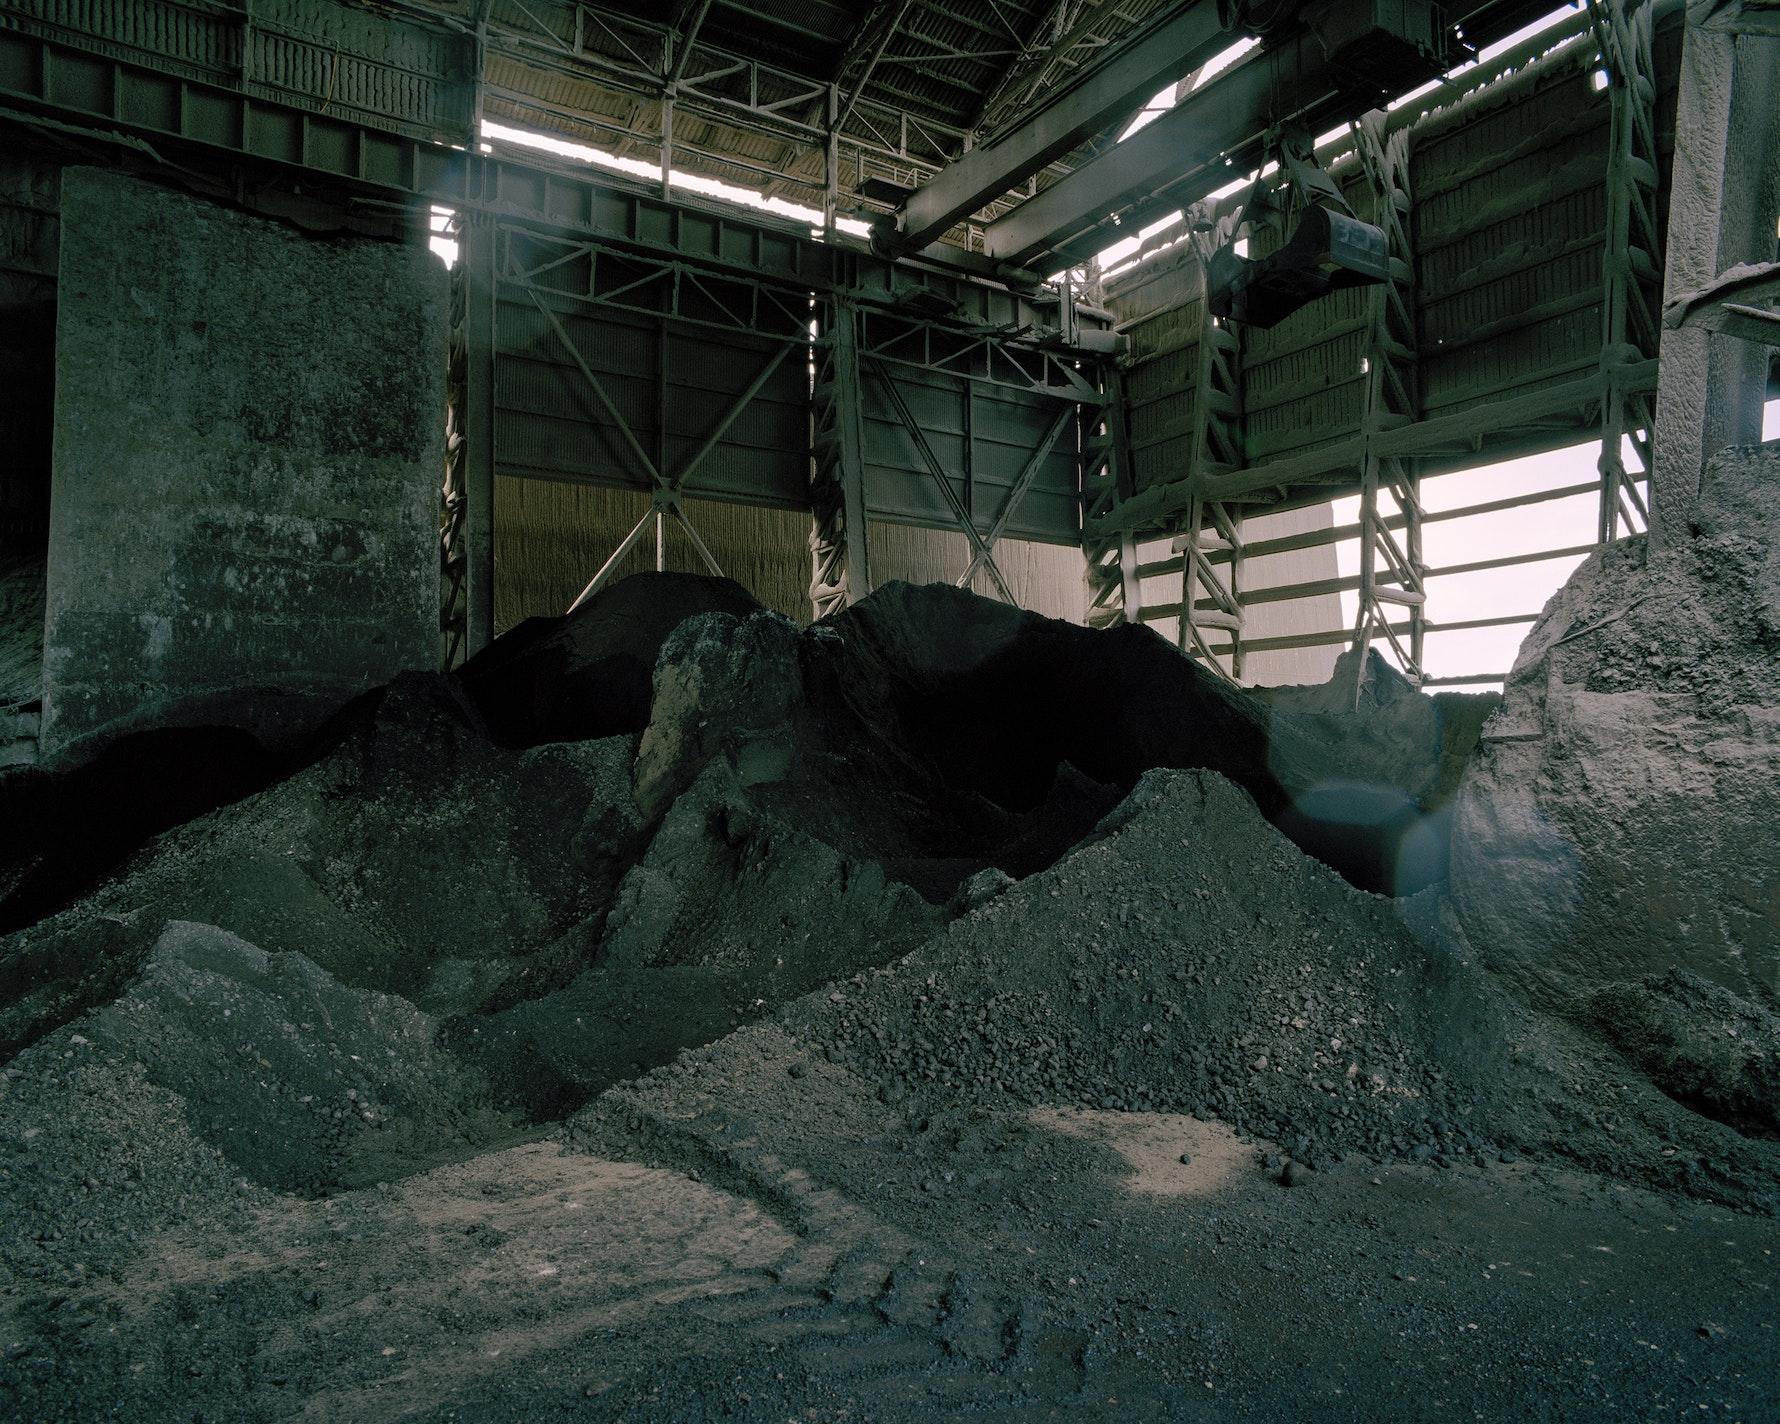 Coal store, Holcim Cement Plant Cape Foulwind, 2016